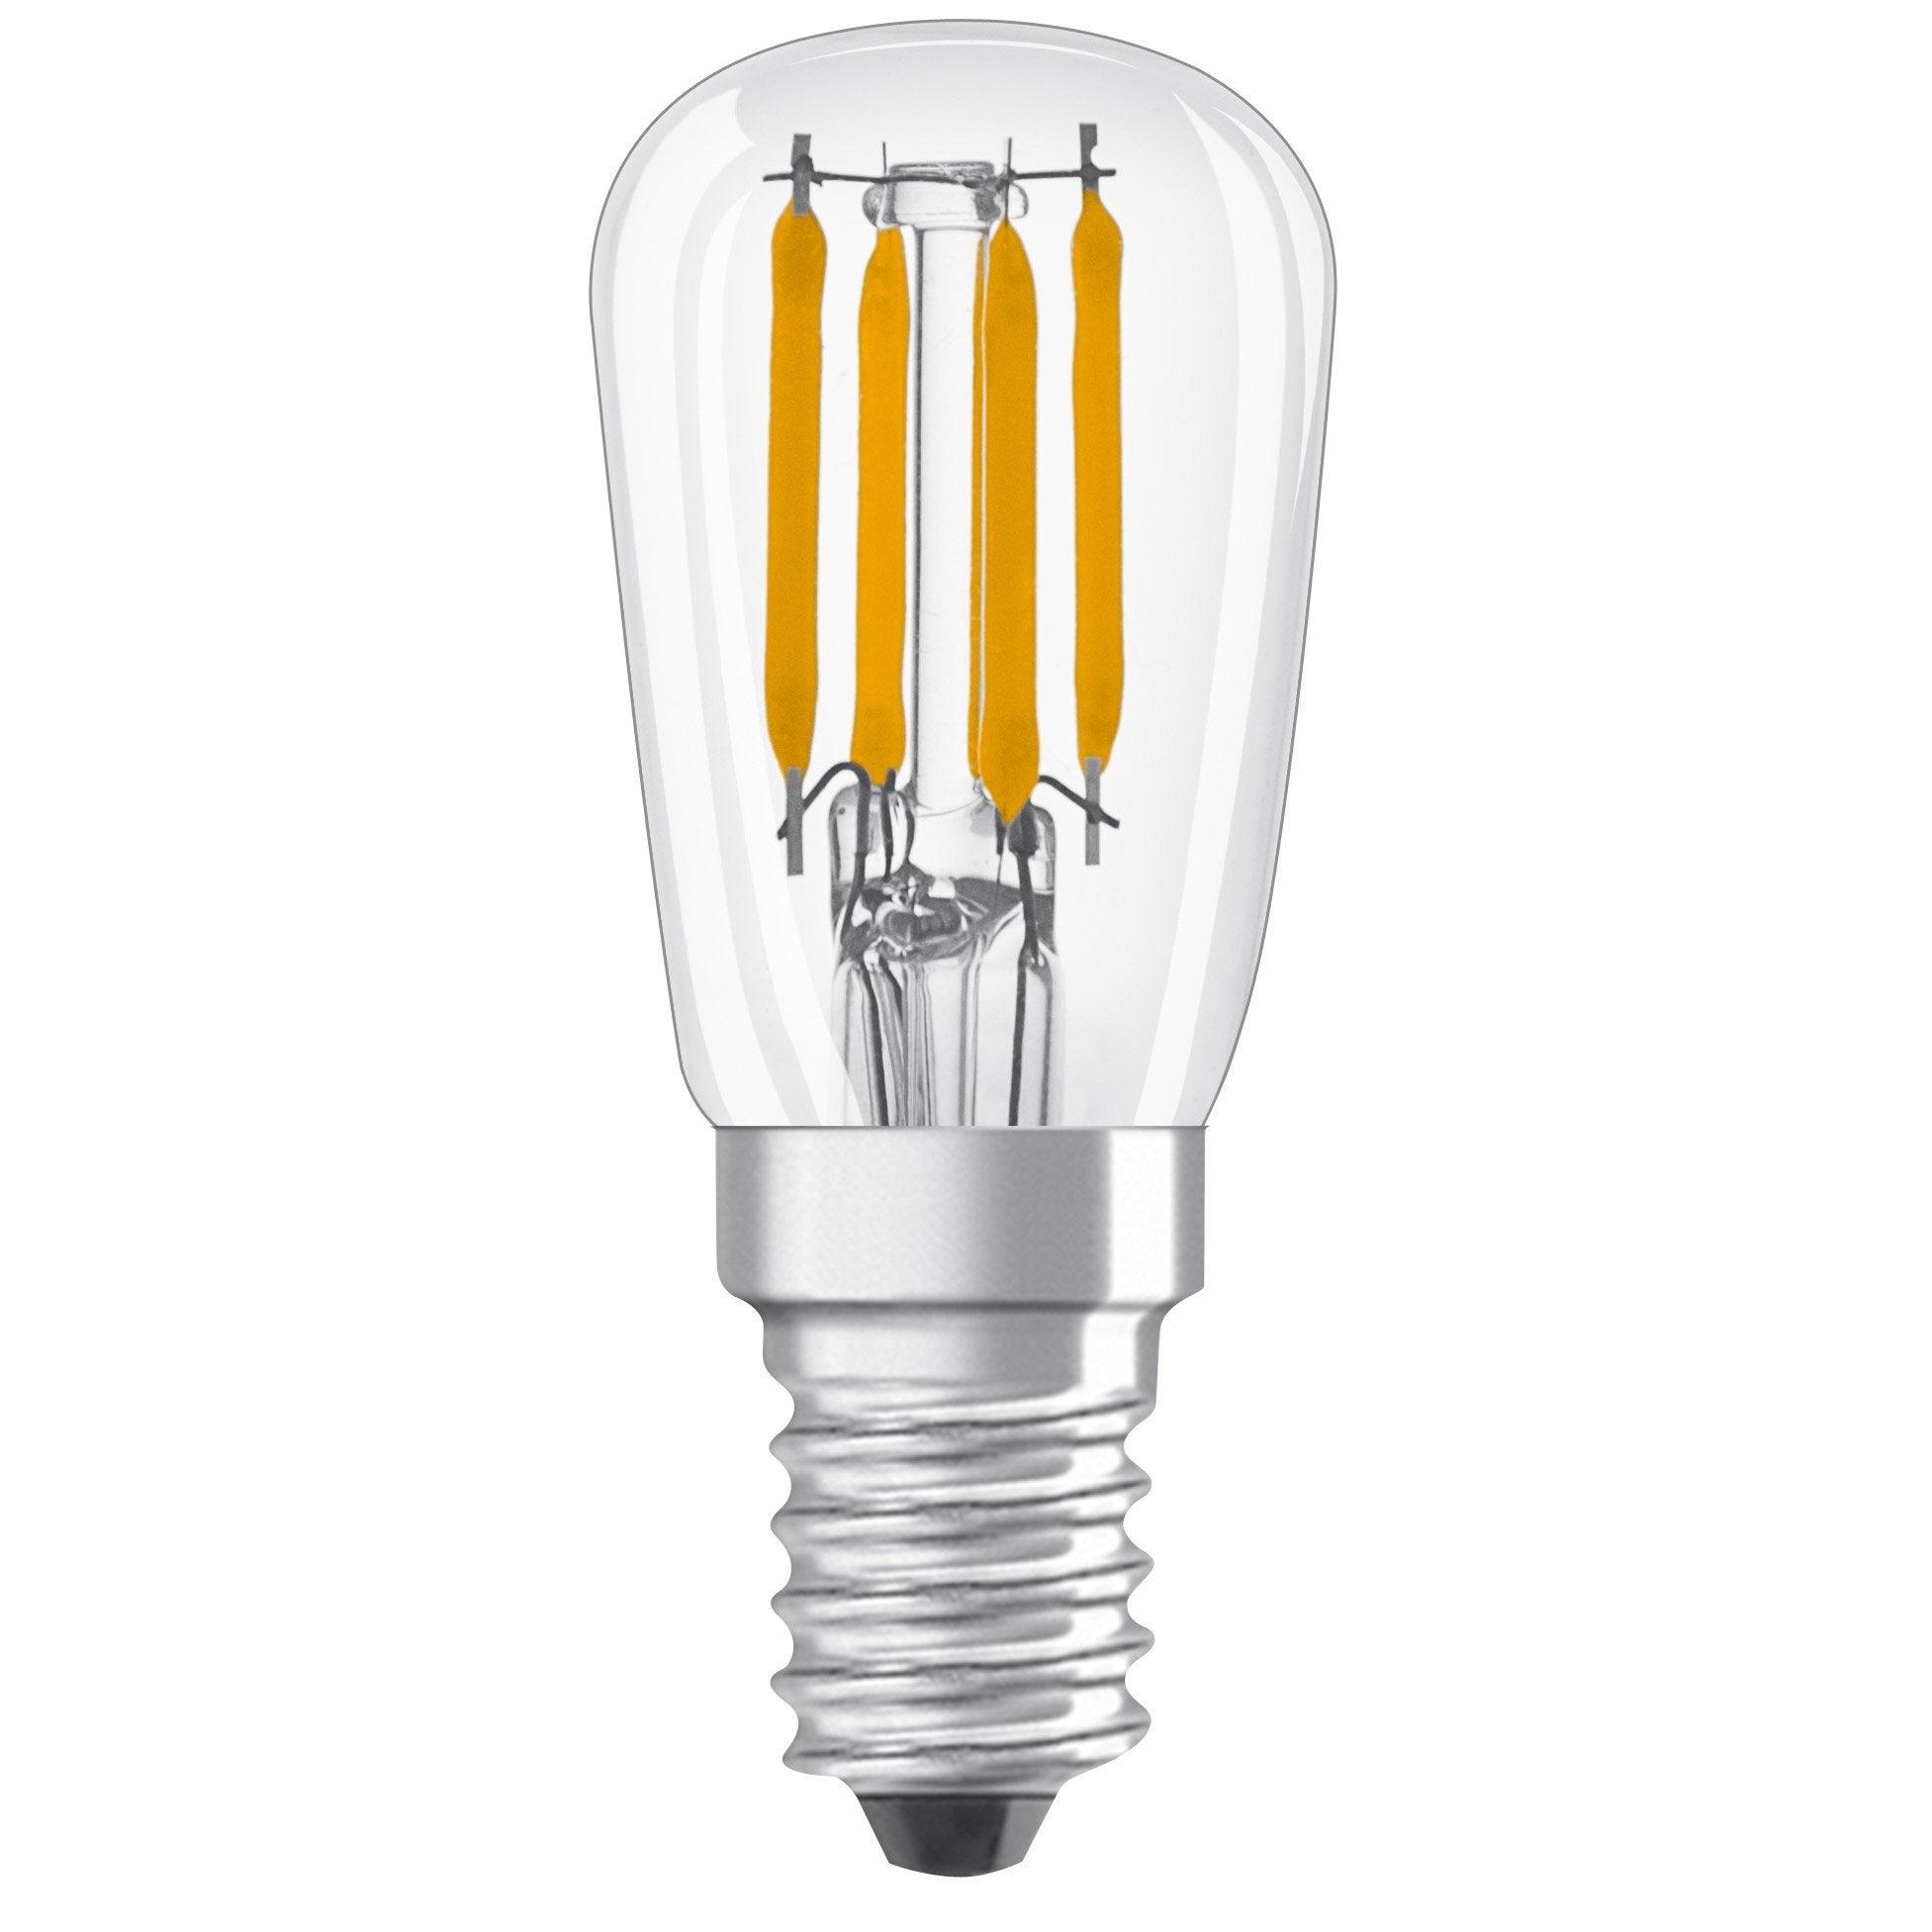 PrixLeroy Merlin Meilleur Ampoule Led G9 Osram 15w Au dCxoBe